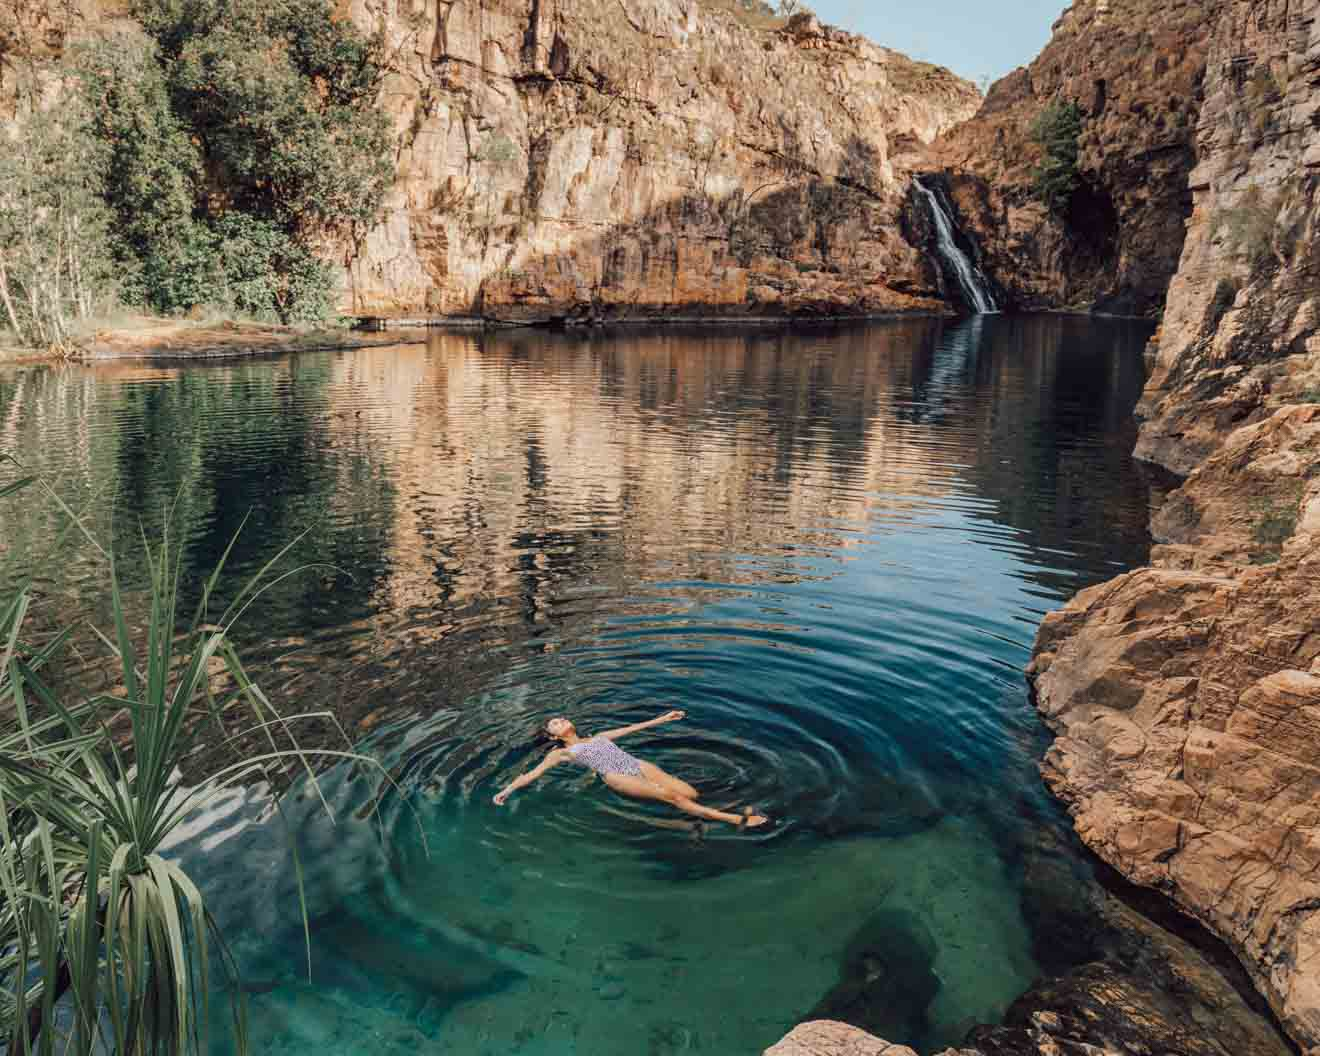 Barramundi Gorge Things to do in Kakadu - visitors guide